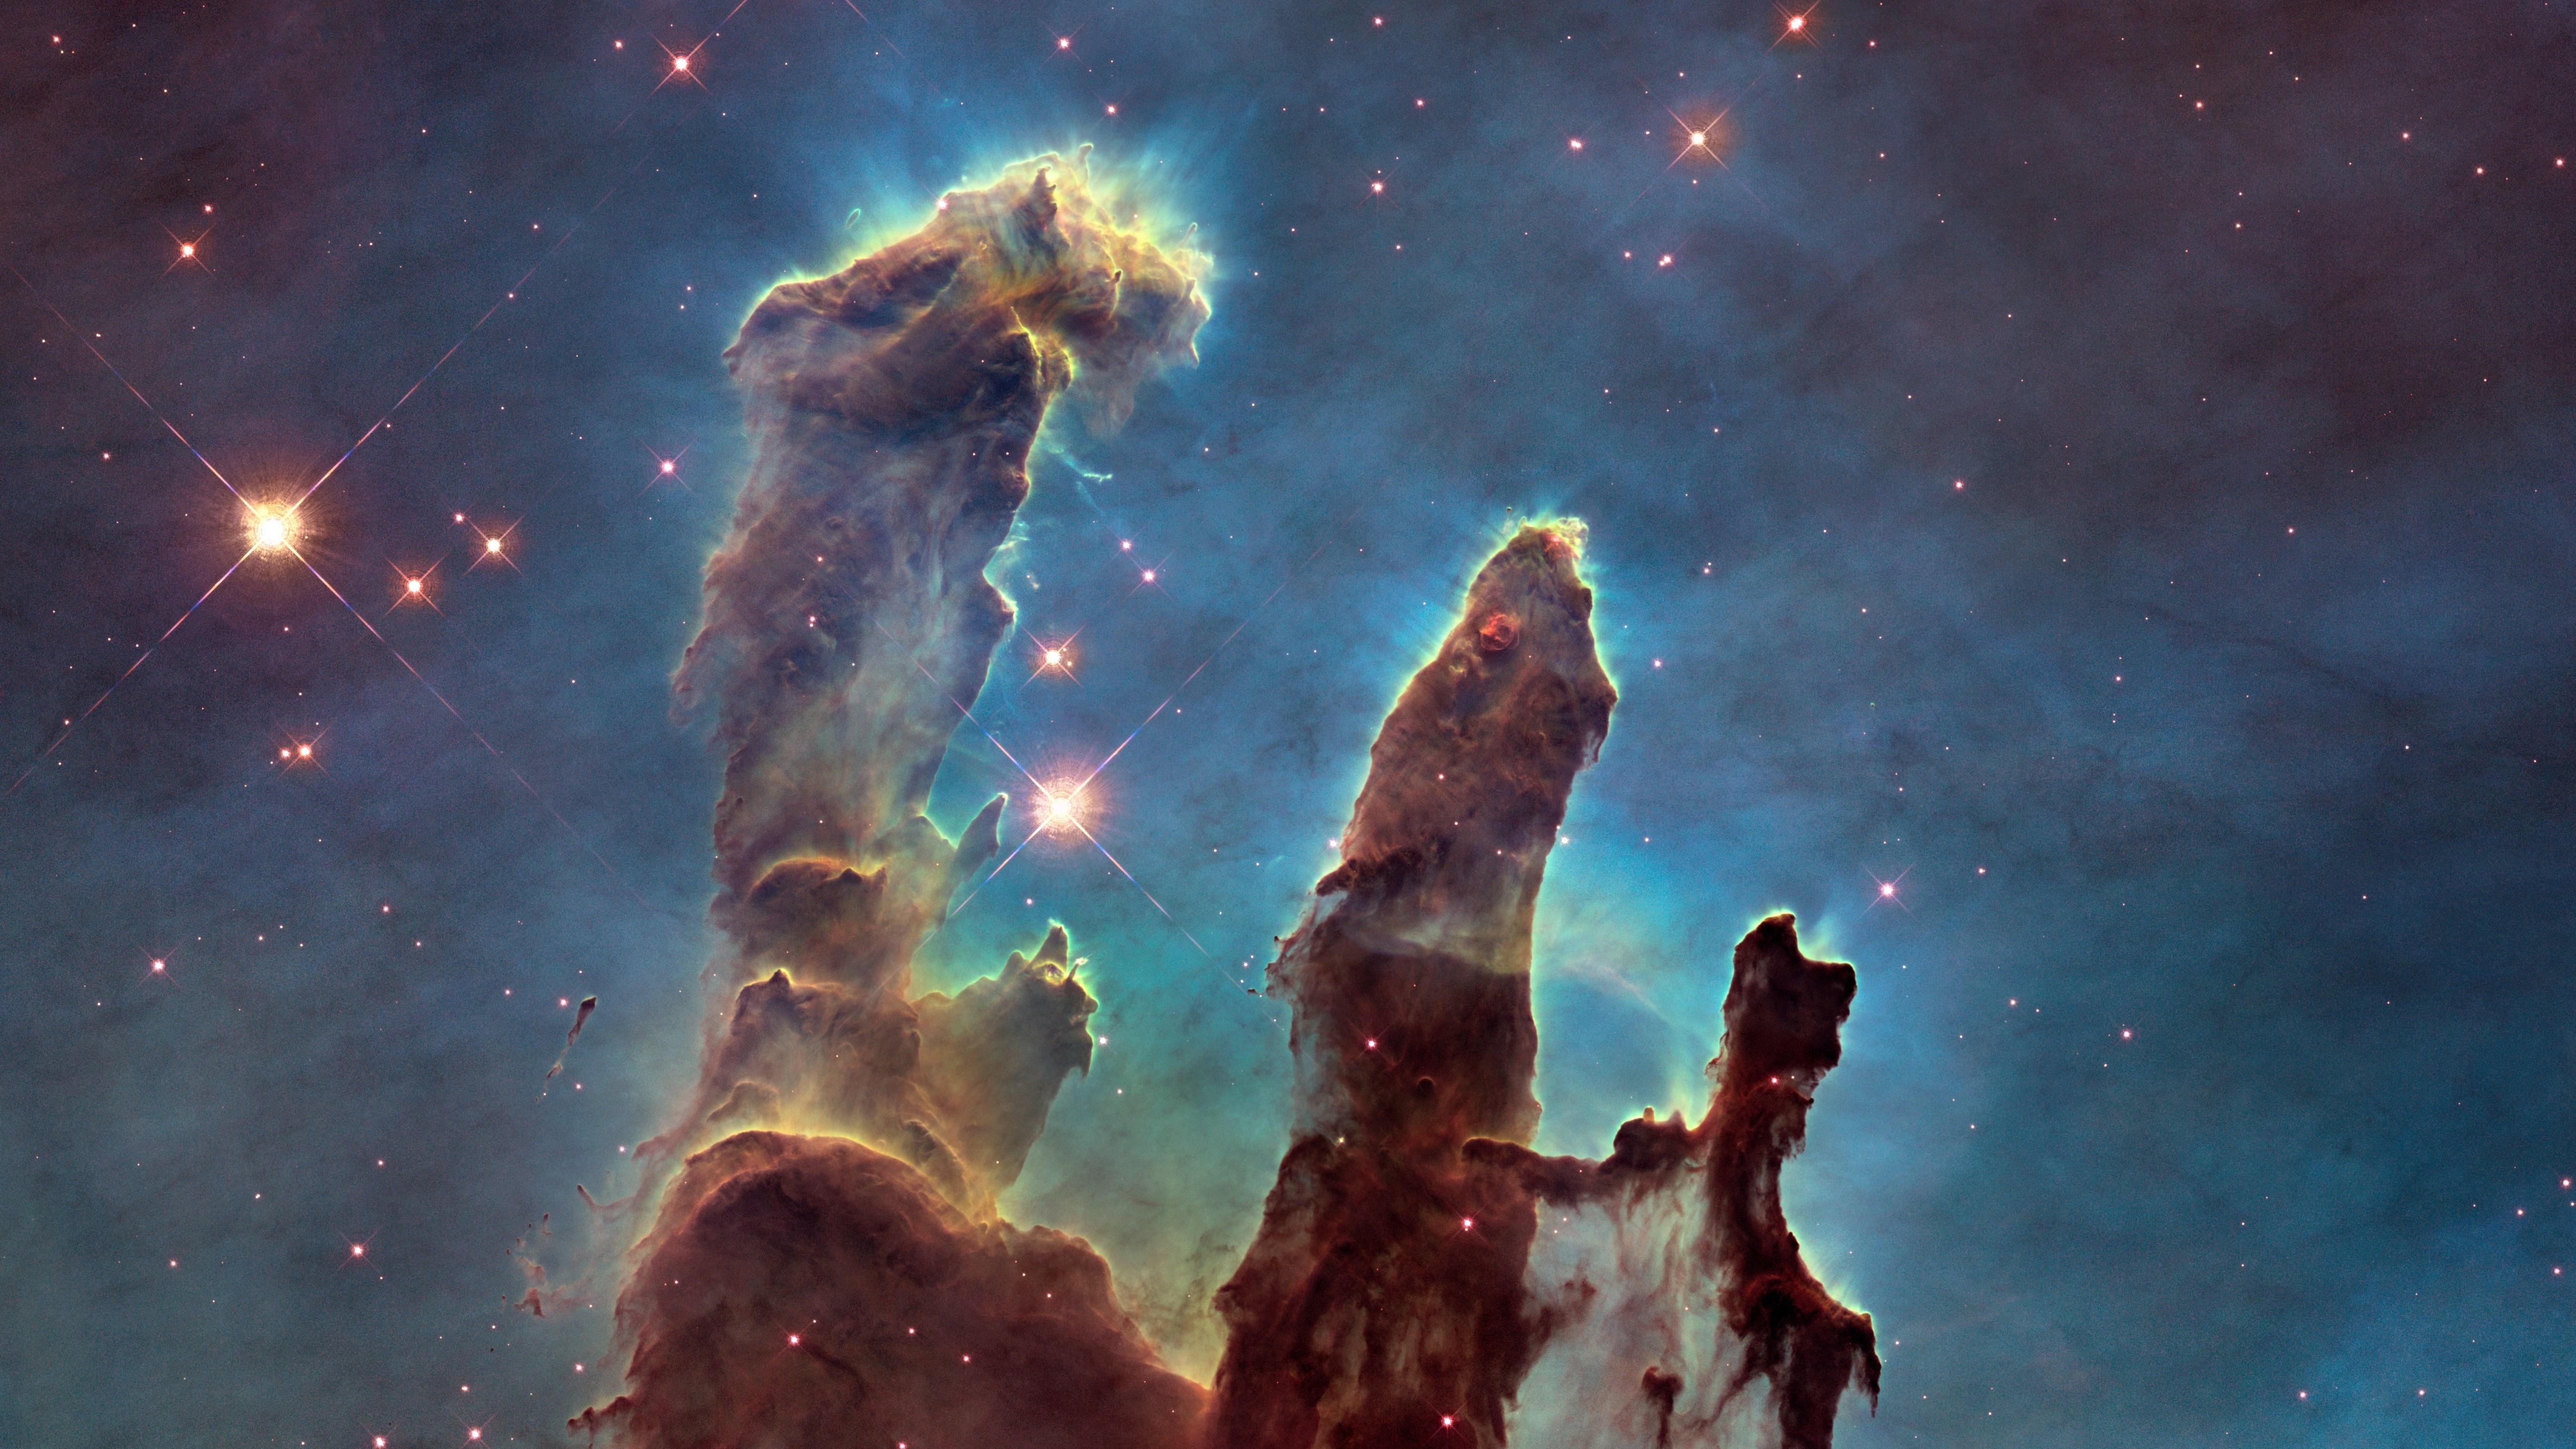 Pillars of Creation wallpaper - backiee